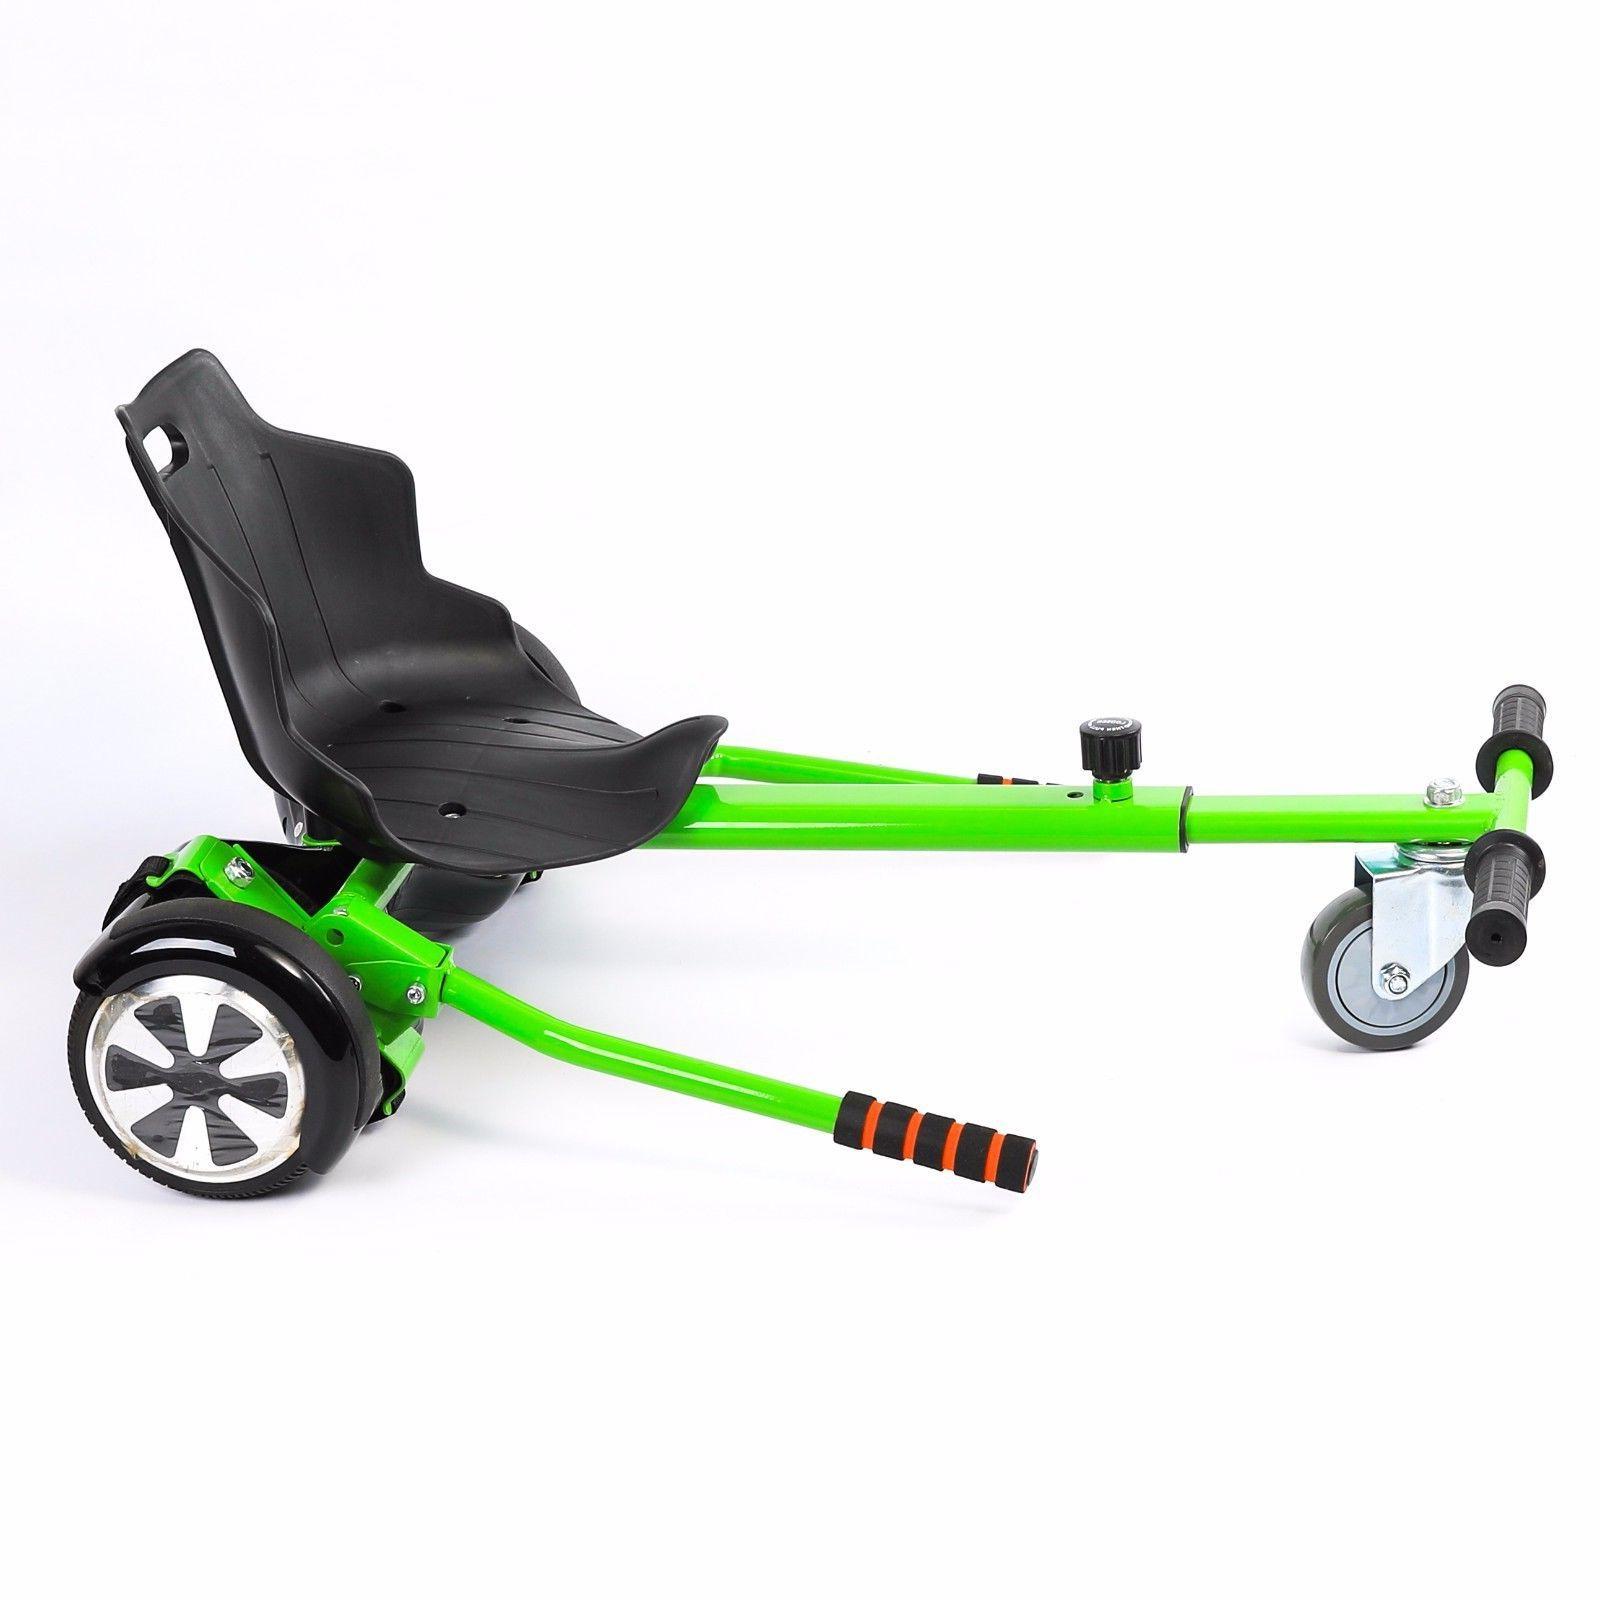 "Adjustable Seat 6.5"" Go Accessories"